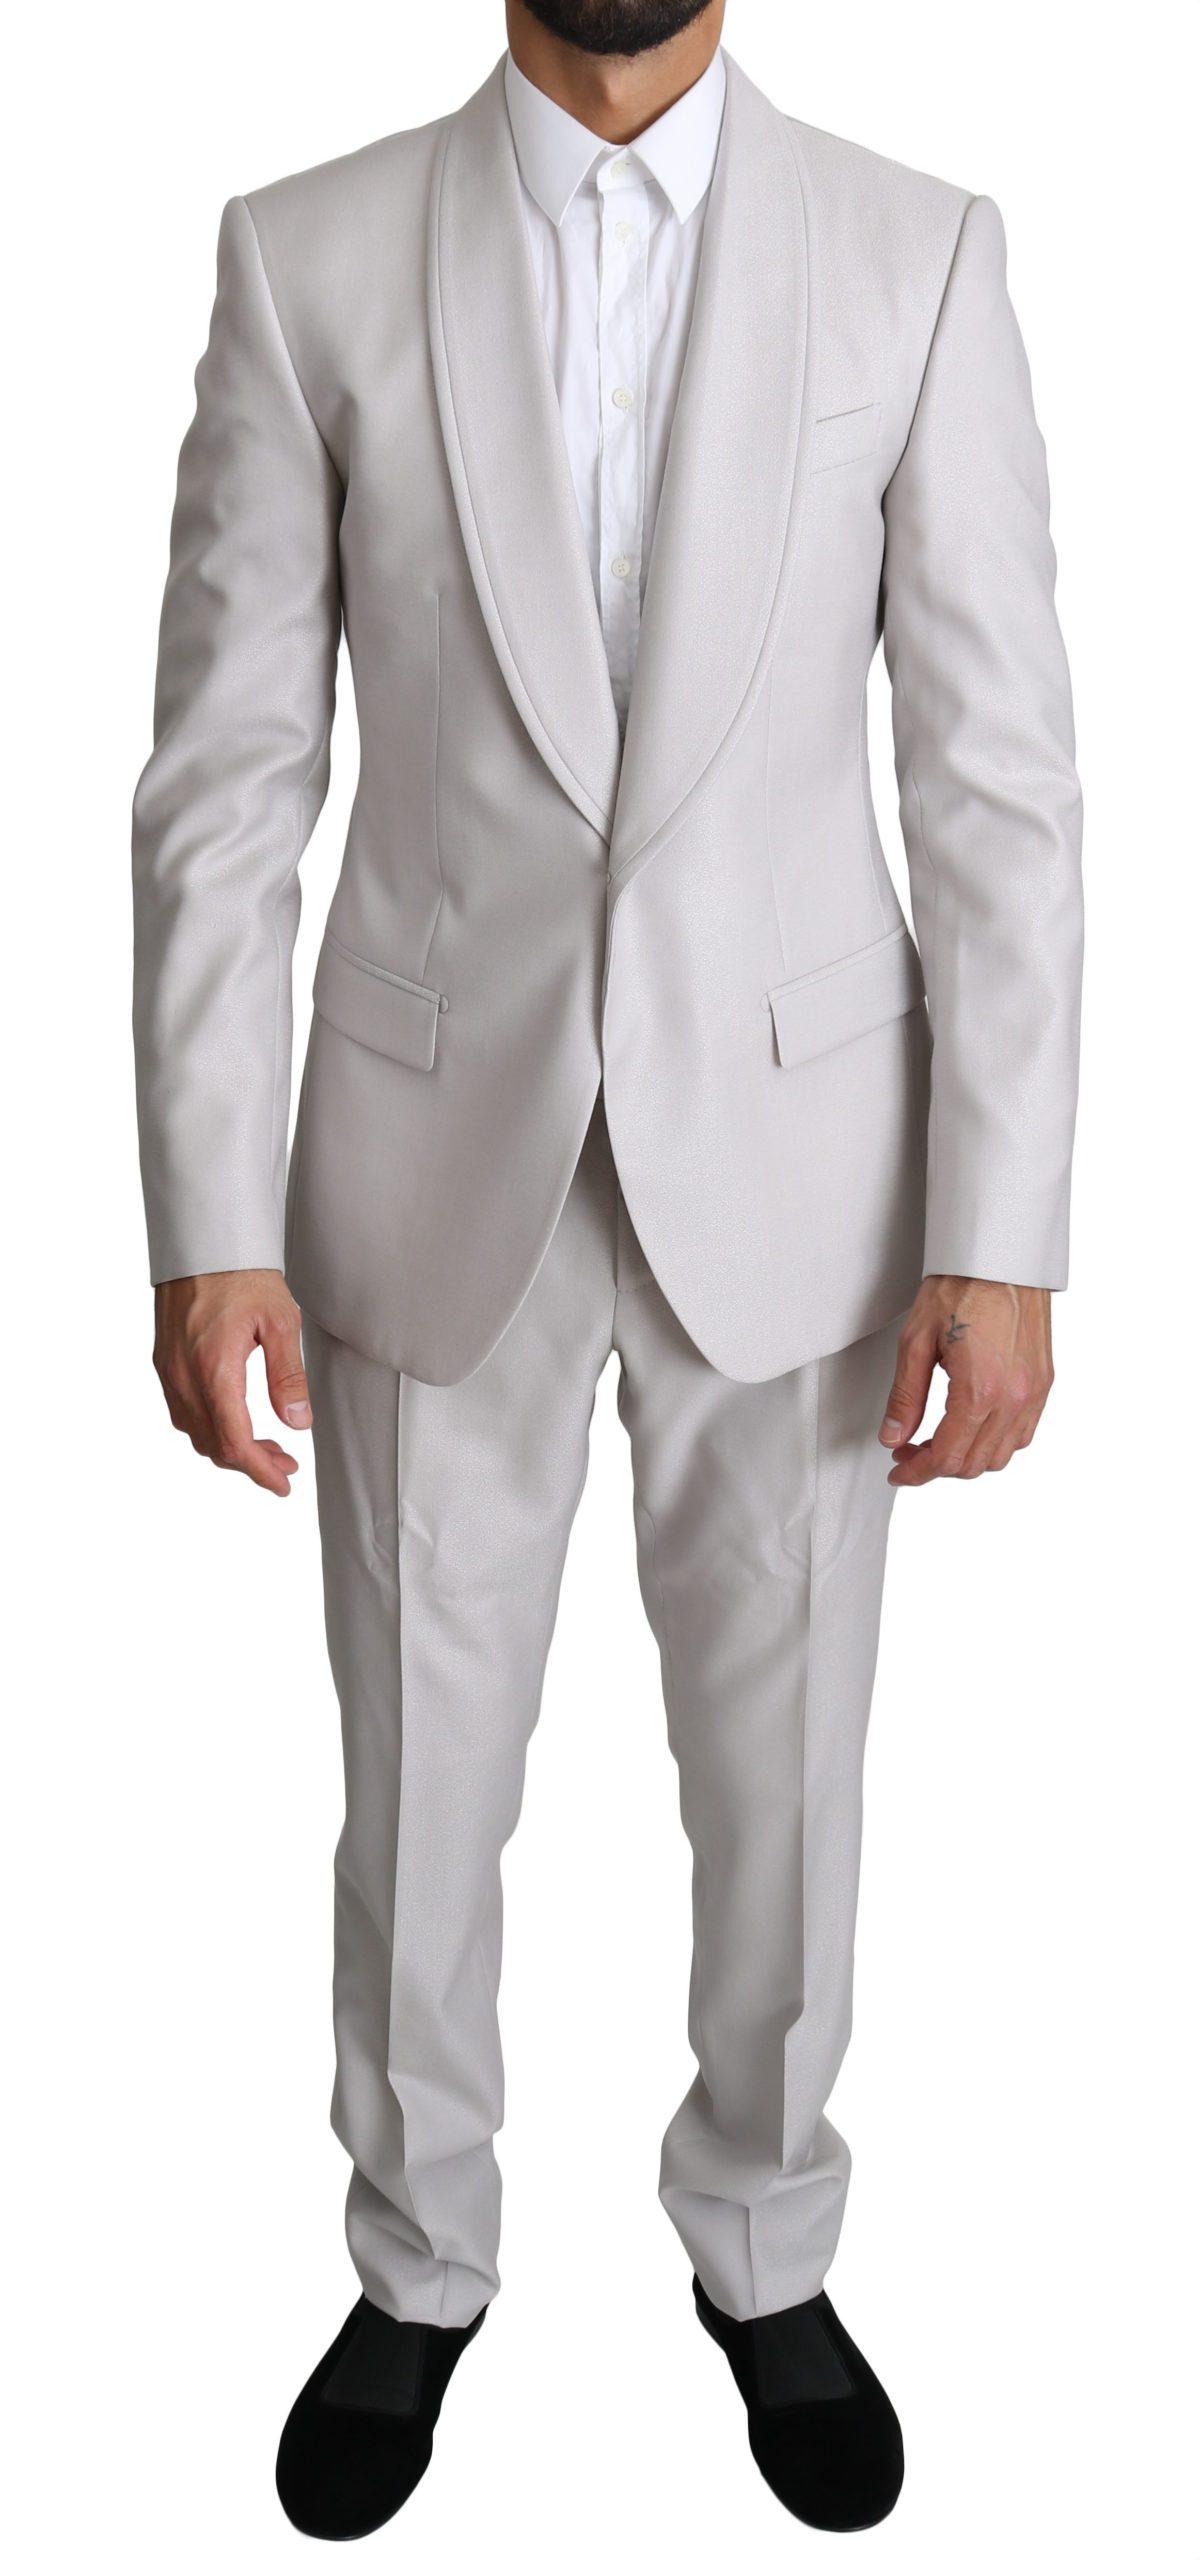 Dolce & Gabbana Men's Single Breasted 2 Piece Suit Gray KOS1549 - IT48   M